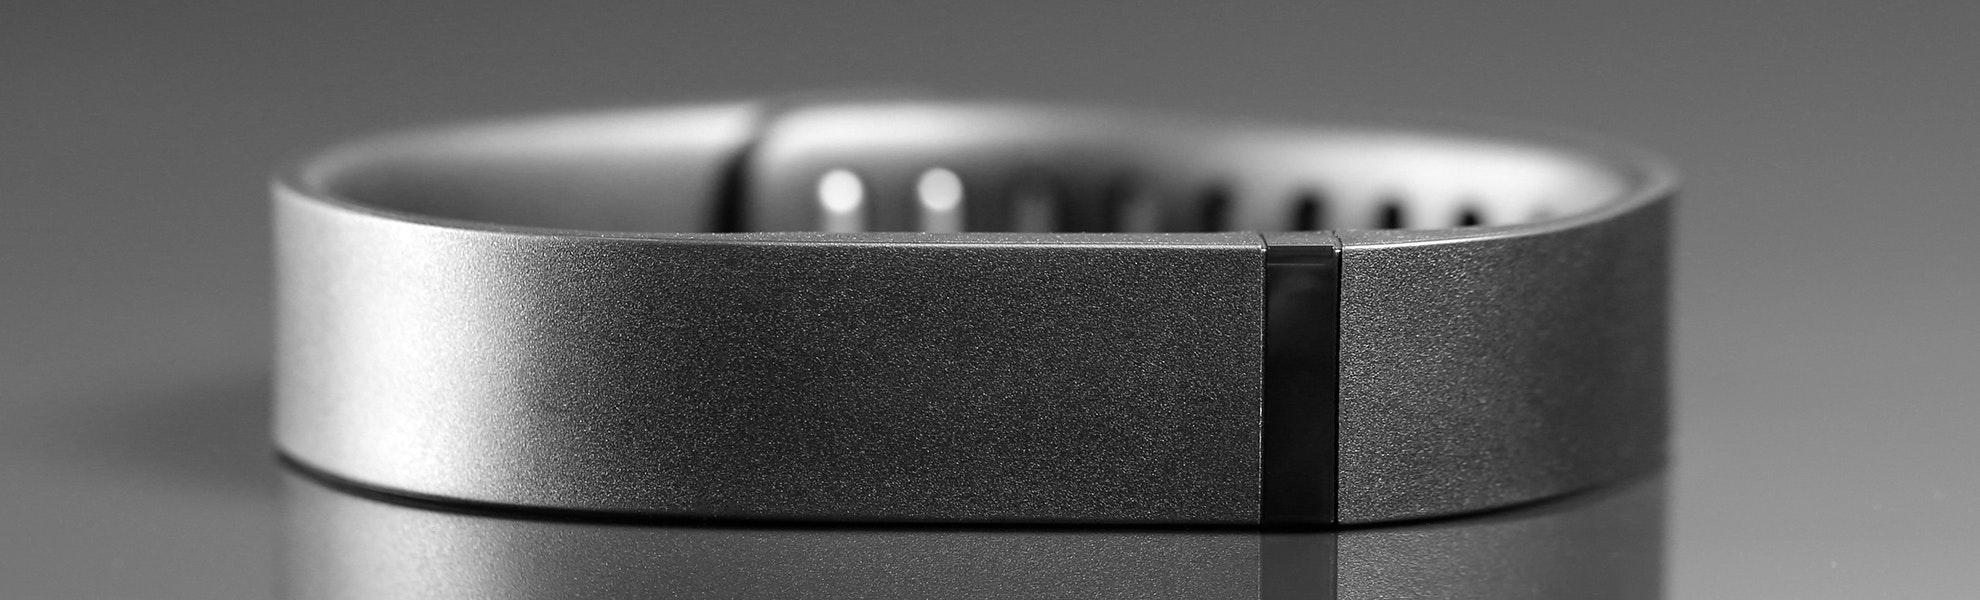 Fitbit Flex Wireless Activity + Sleep Wristband